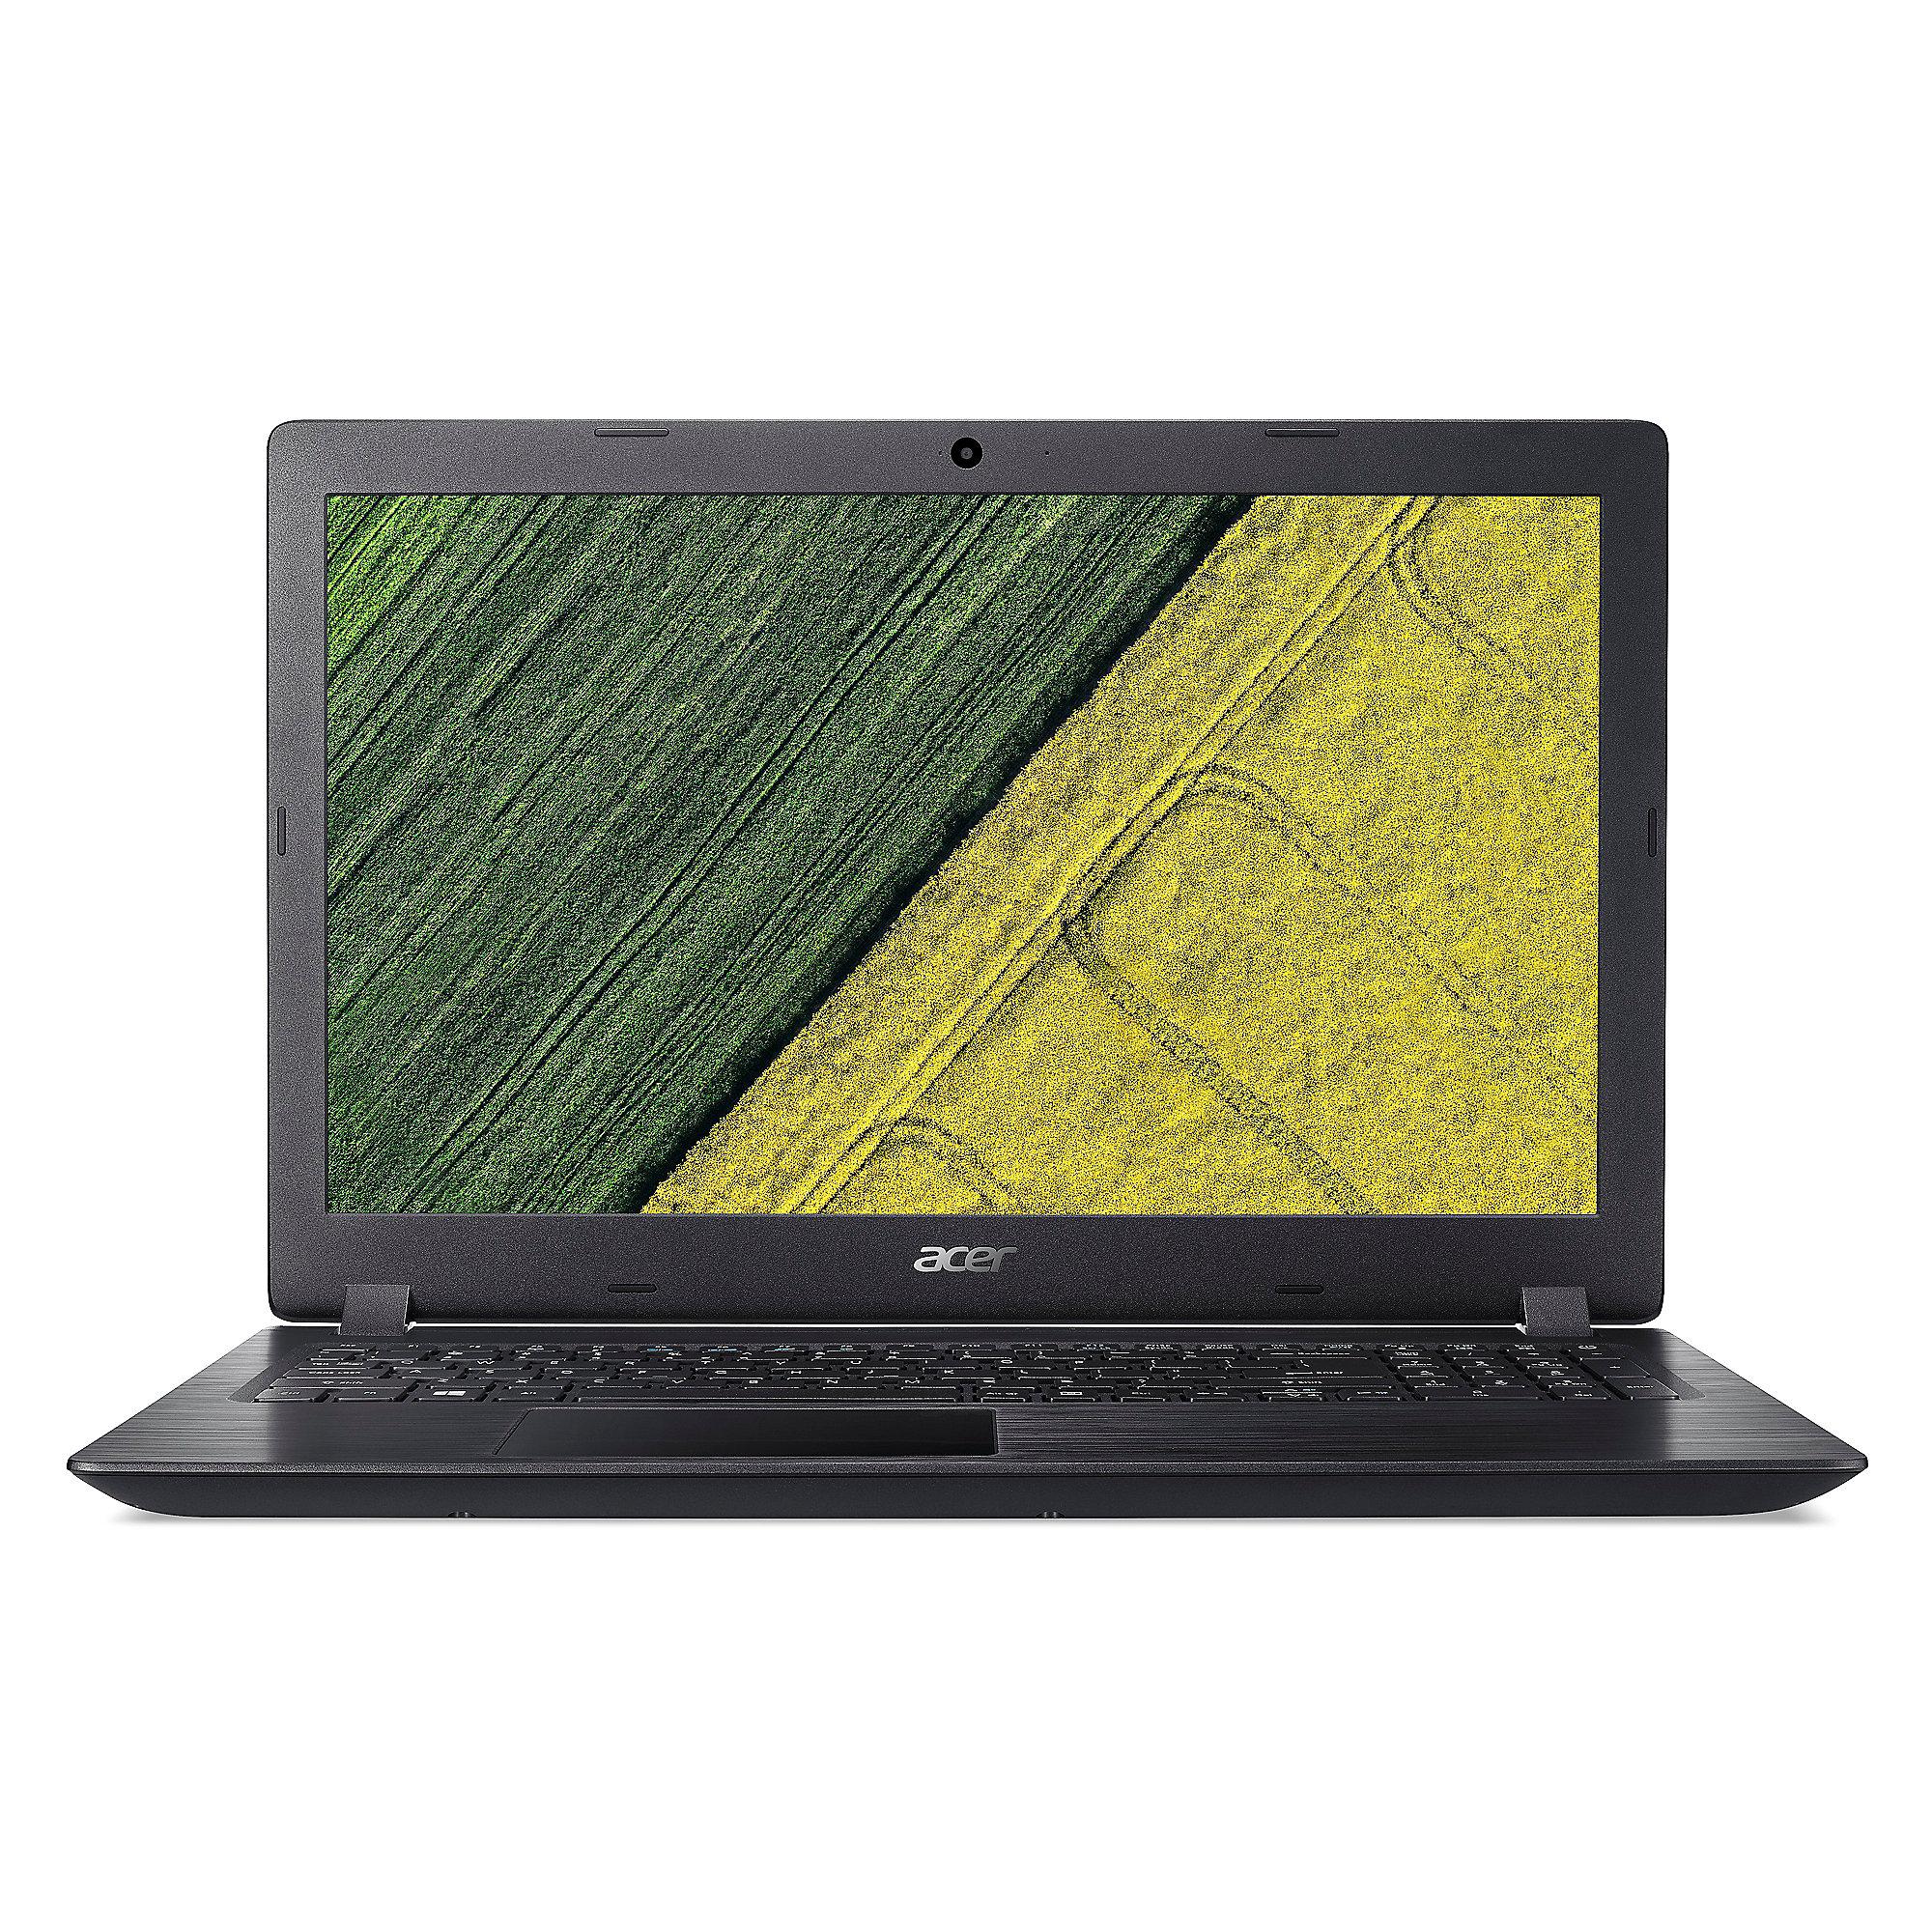 Acer Aspire 3 A315 (15,6'' FHD matt, i5-7200U, 8GB RAM, 256GB SSD) für 394,95€ [Cyberport]